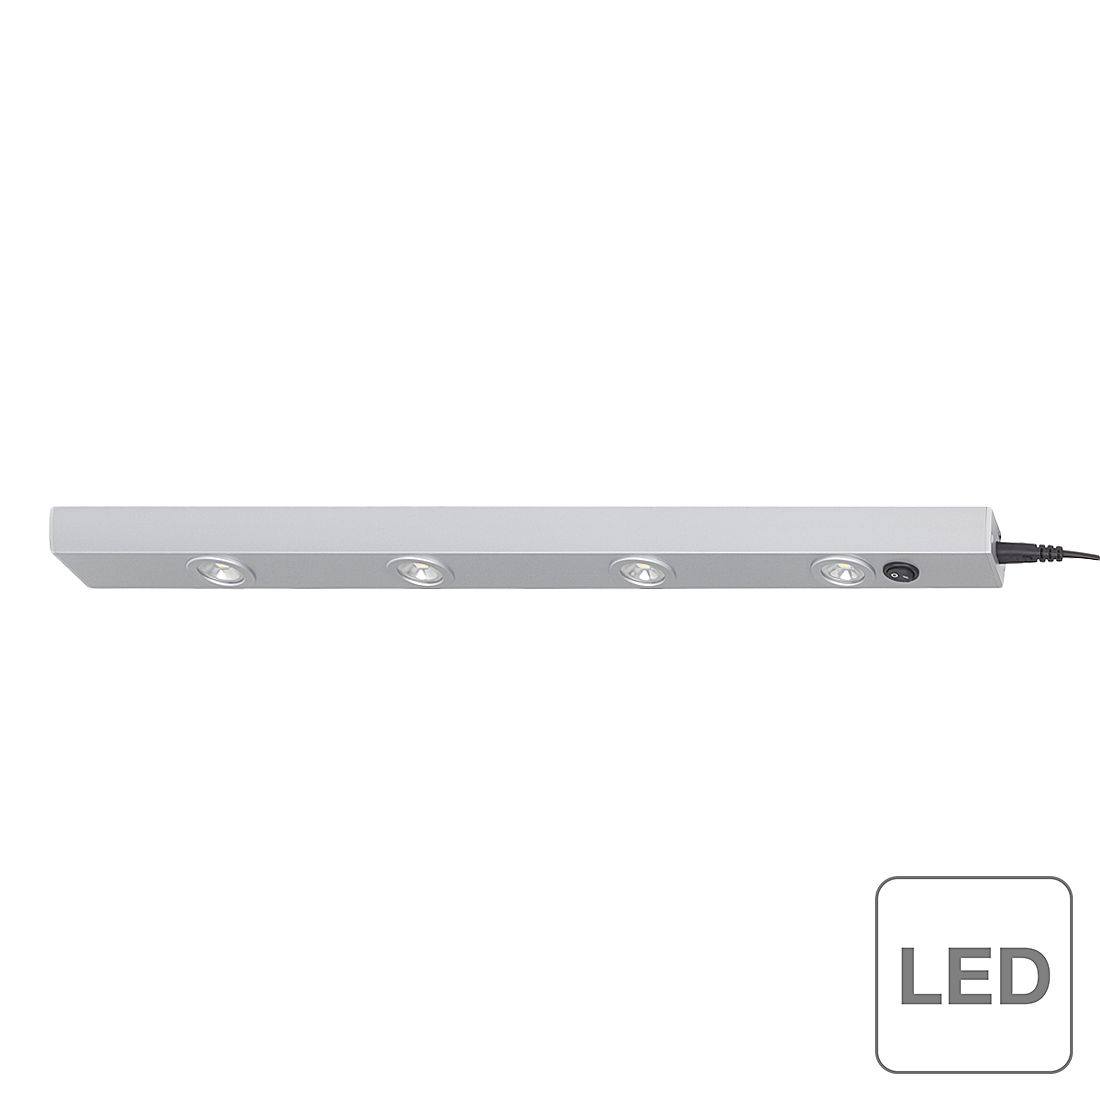 energie  A+, Inbouwlamp Norbert - 4 lichtbronnen, Brilliant